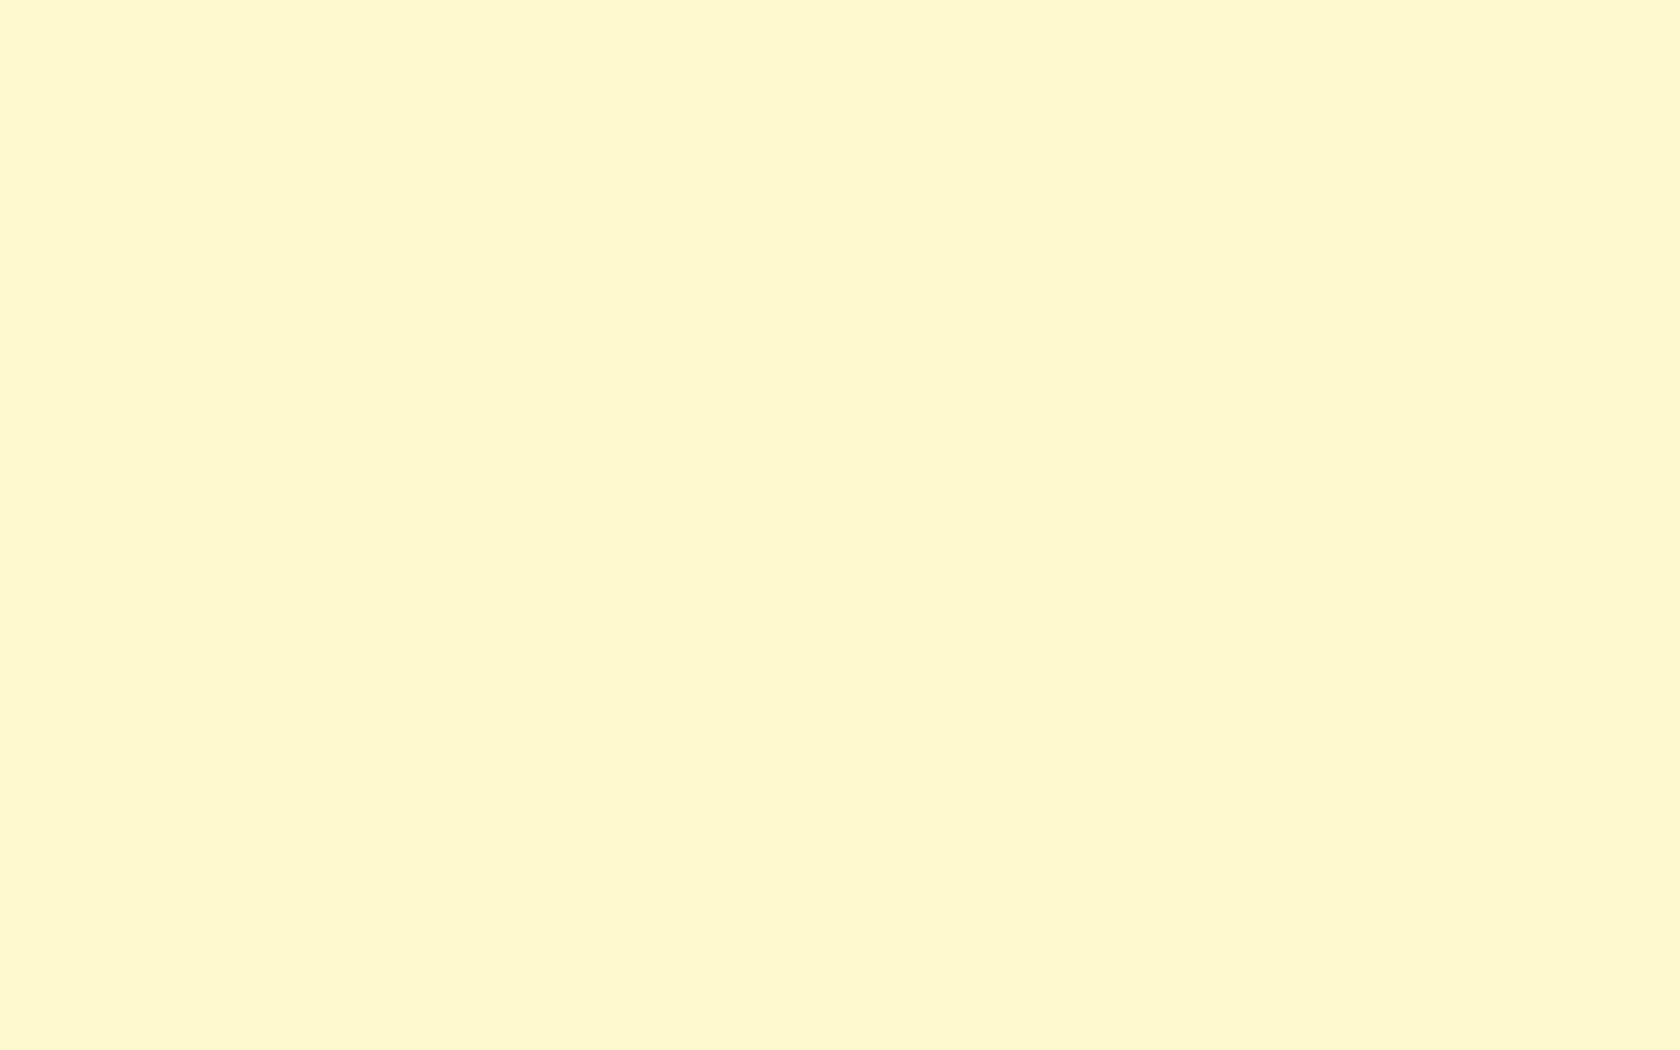 1680x1050 Lemon Chiffon Solid Color Background